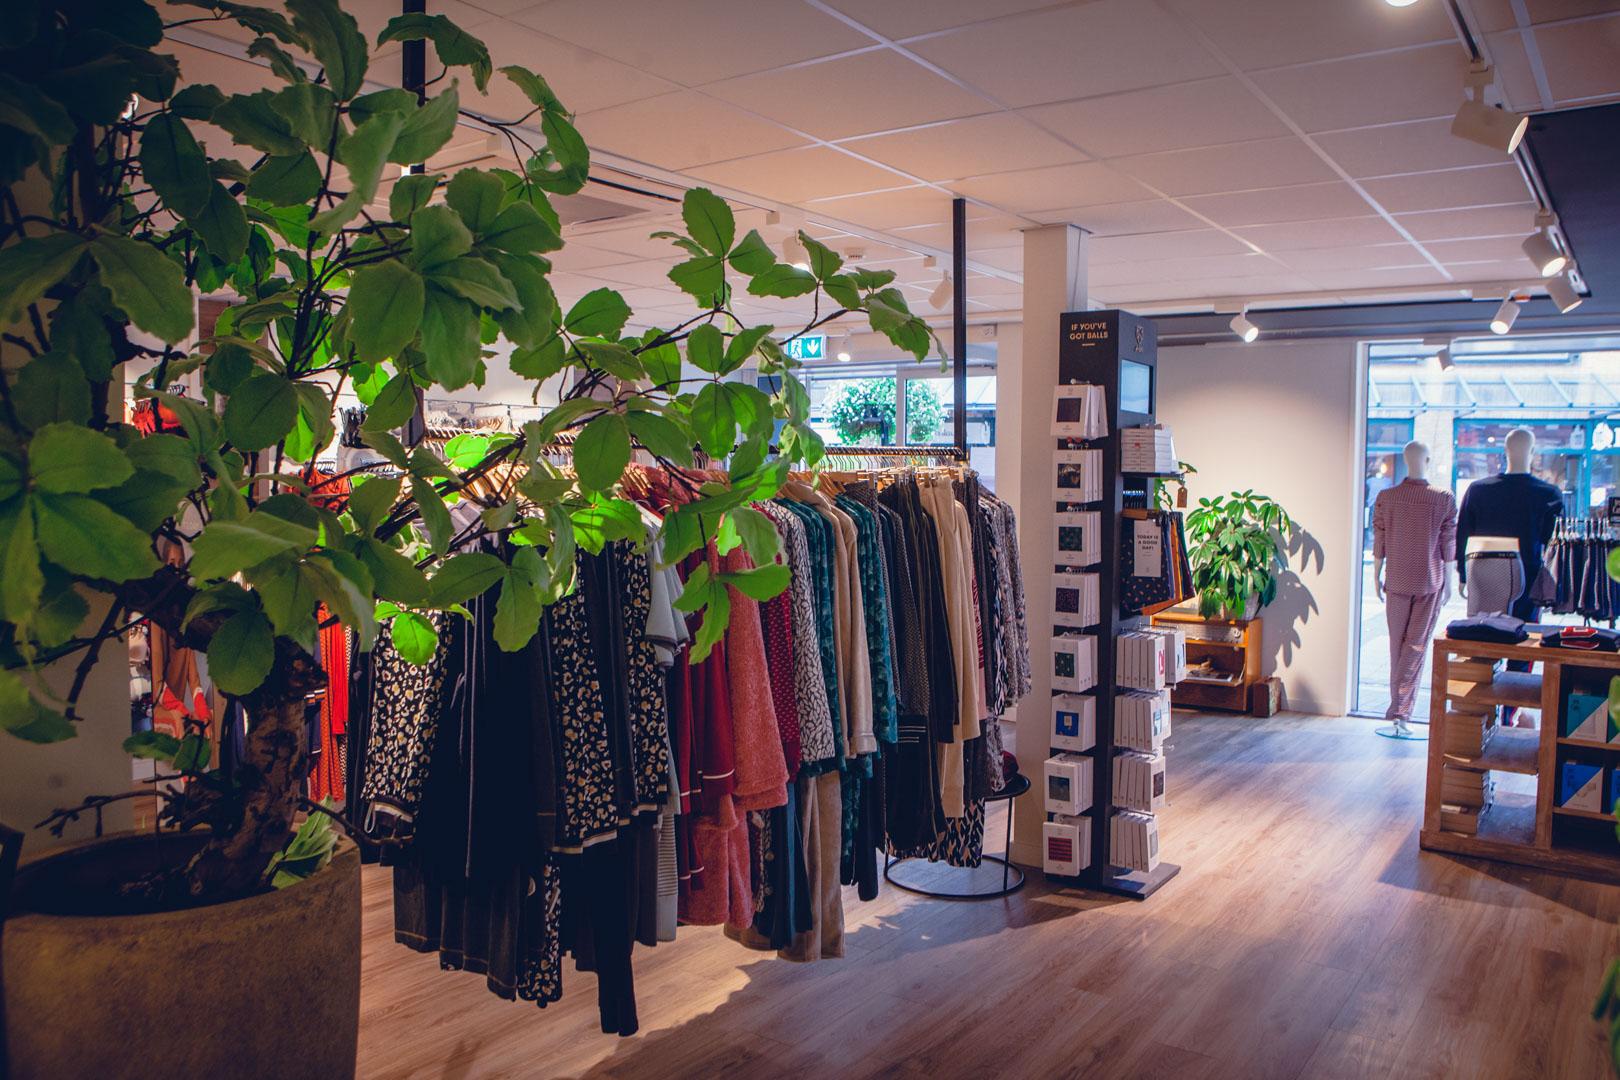 https://bilow-underwear.nl/wp-content/uploads/2020/10/Bilow-Underwear-Beuningen-Collectie-11.jpg